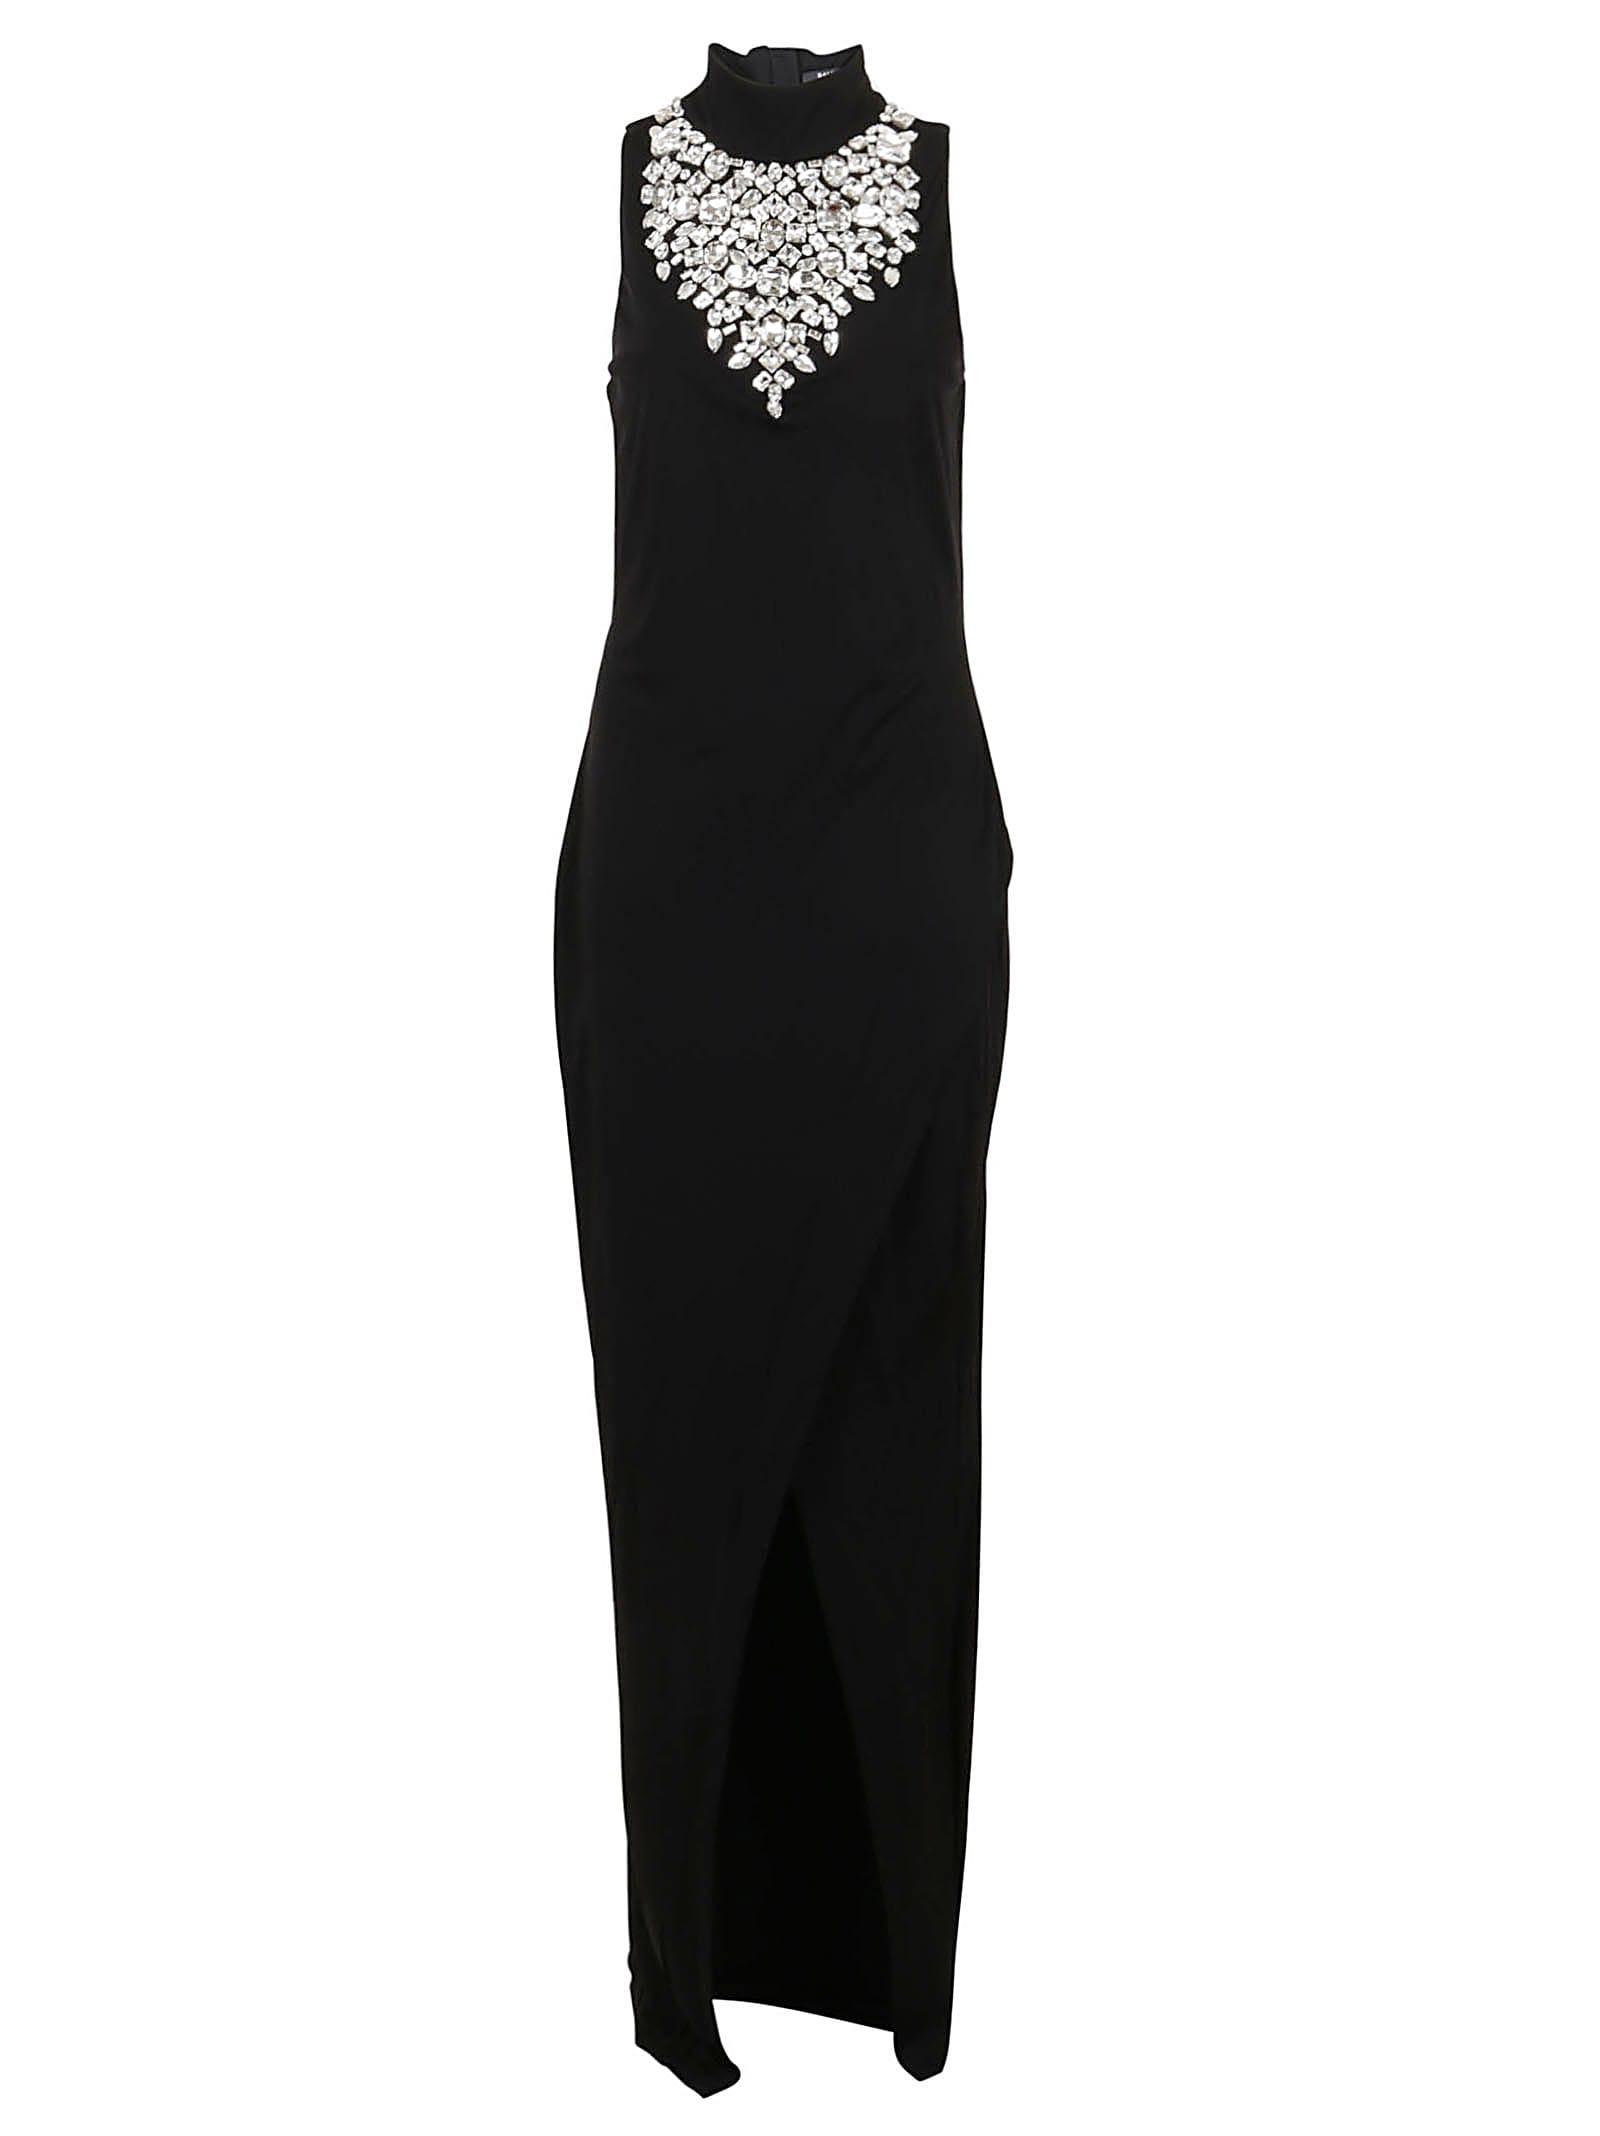 Balmain Long Sleeveless Embroidered Dress